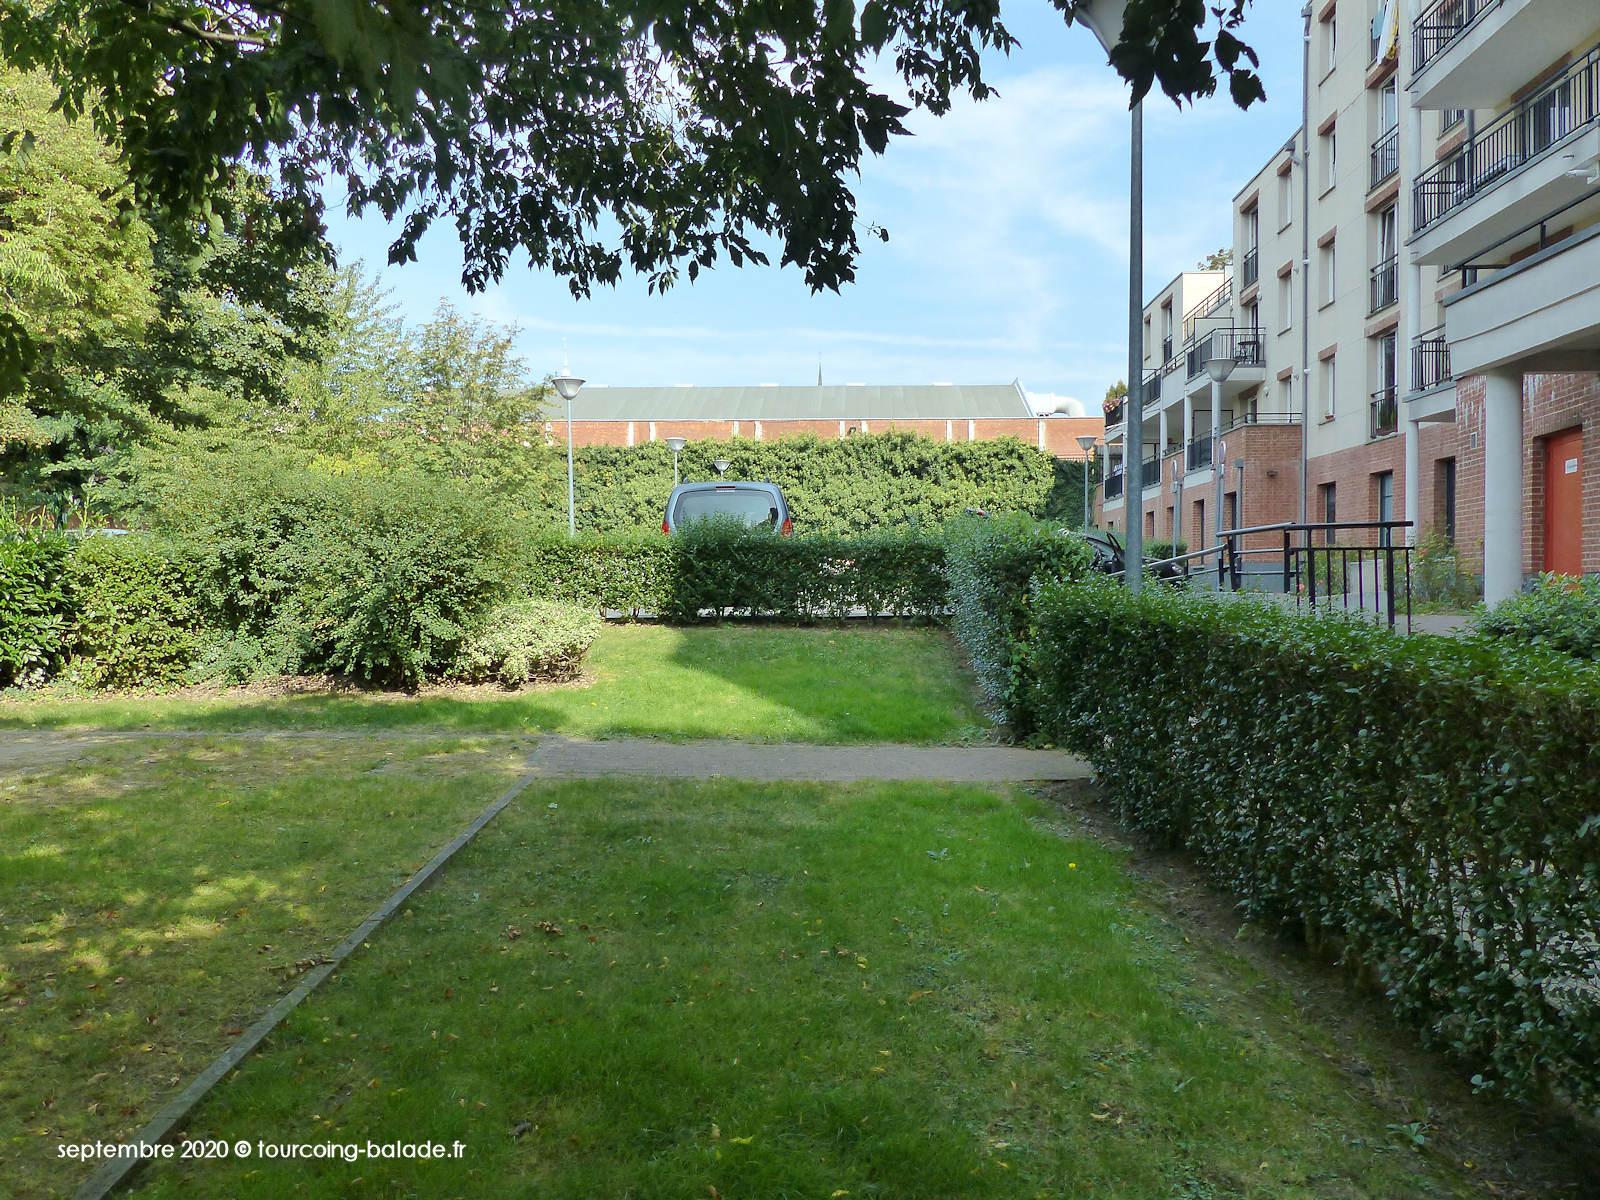 Jardin Résidence Turenne, Tourcoing 2020